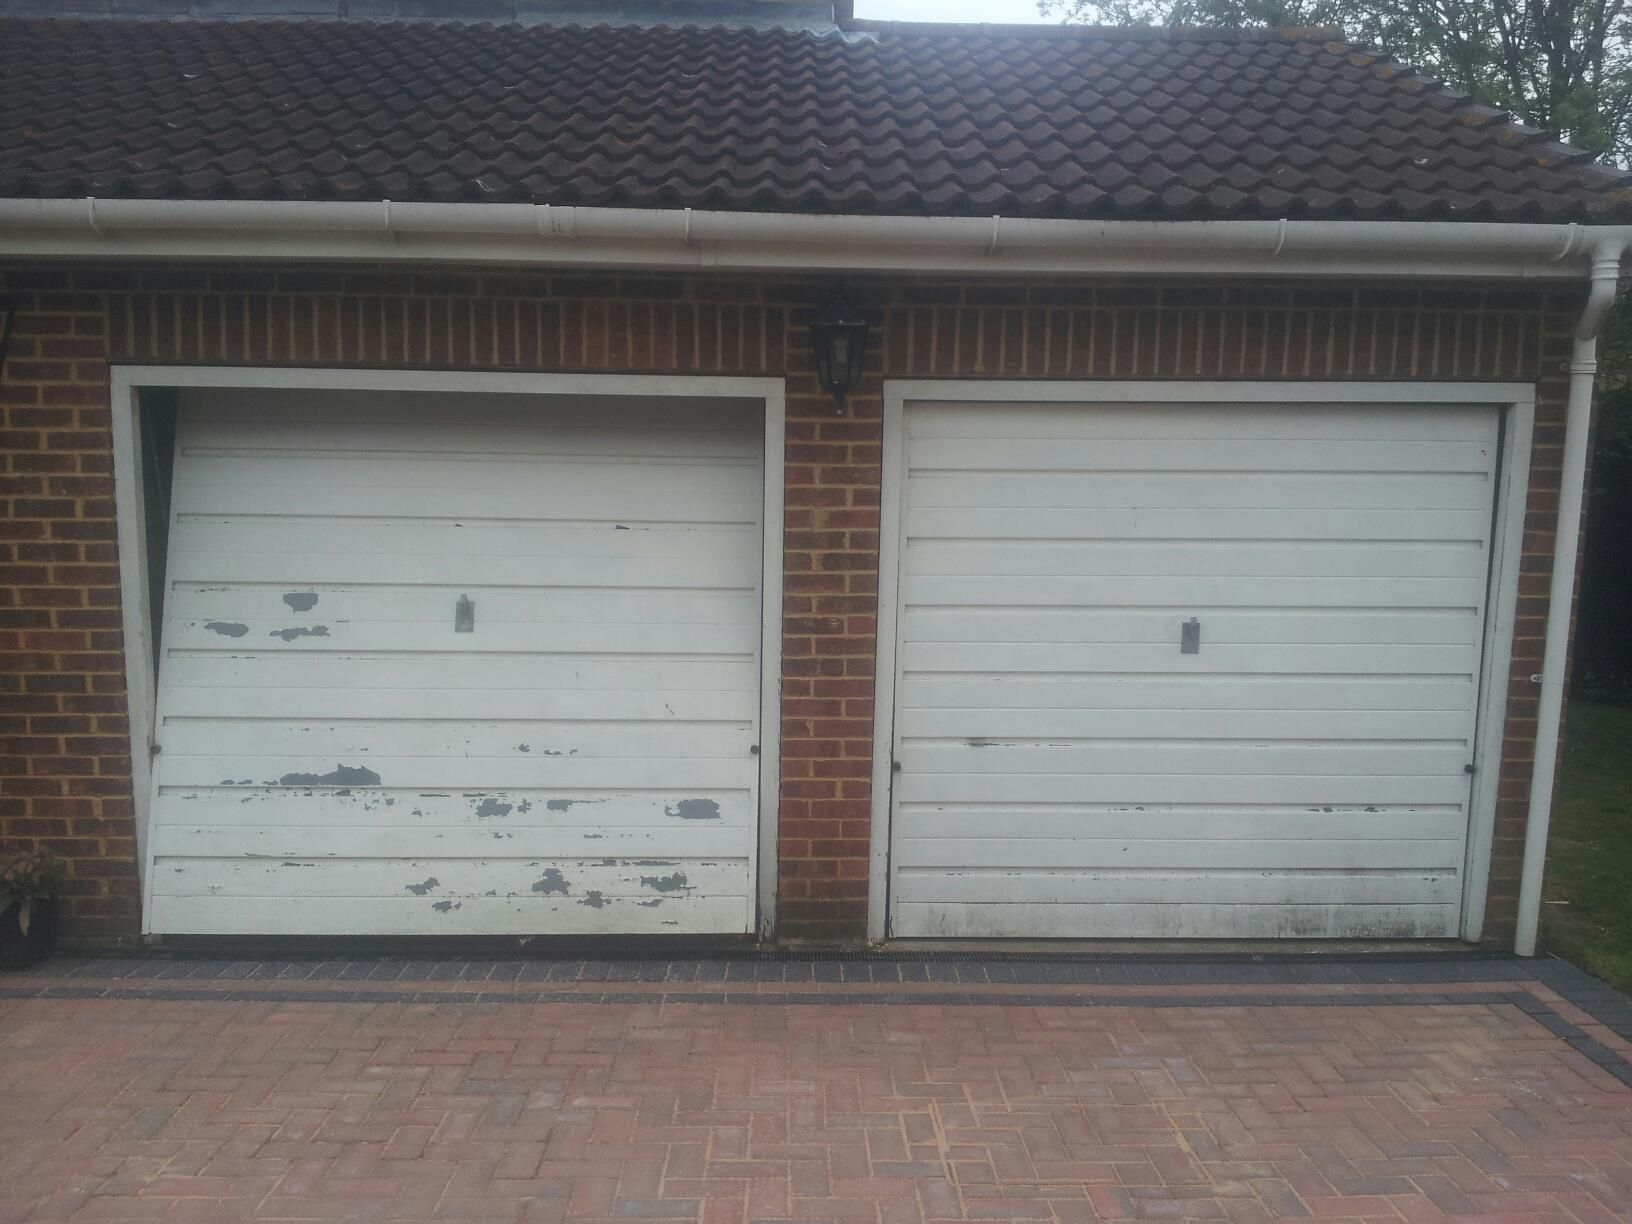 dalton interior garage opener roll parts wilde wayne size up full glass quantum door sliding residential doors joe of doorroll commercial